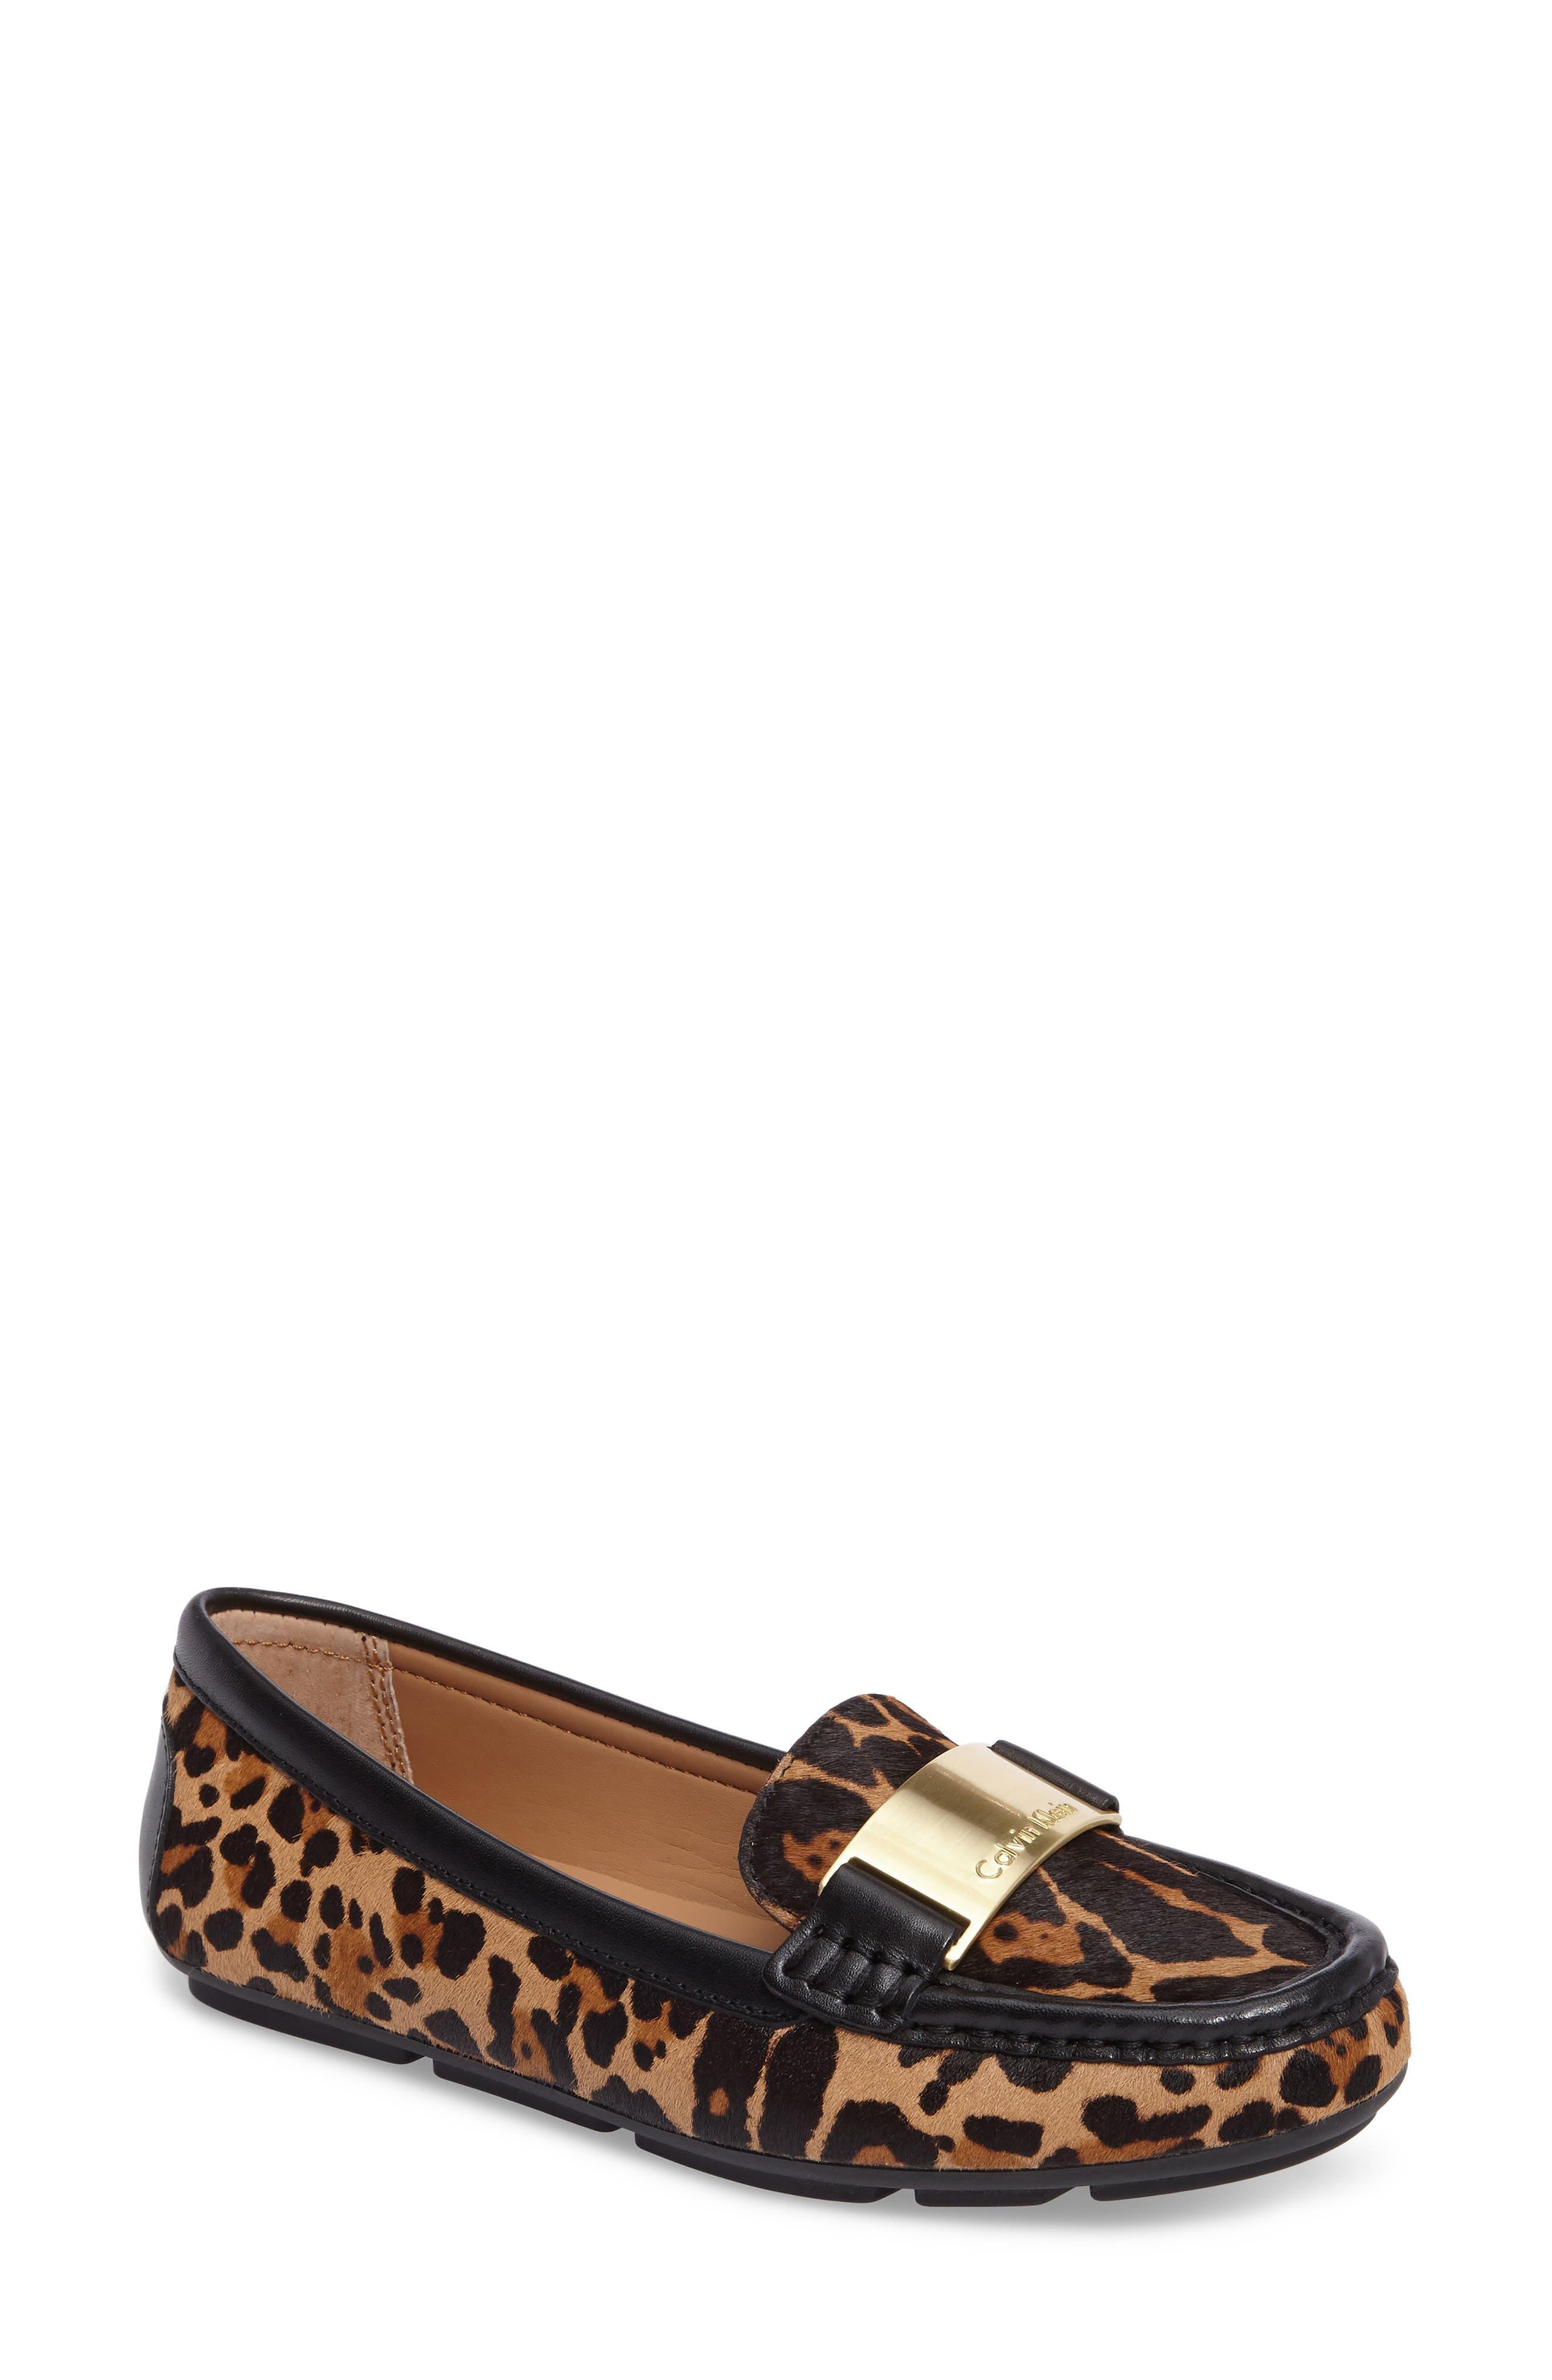 Lisette Loafer,                             Main thumbnail 1, color,                             Natural Leopard Hair Calf